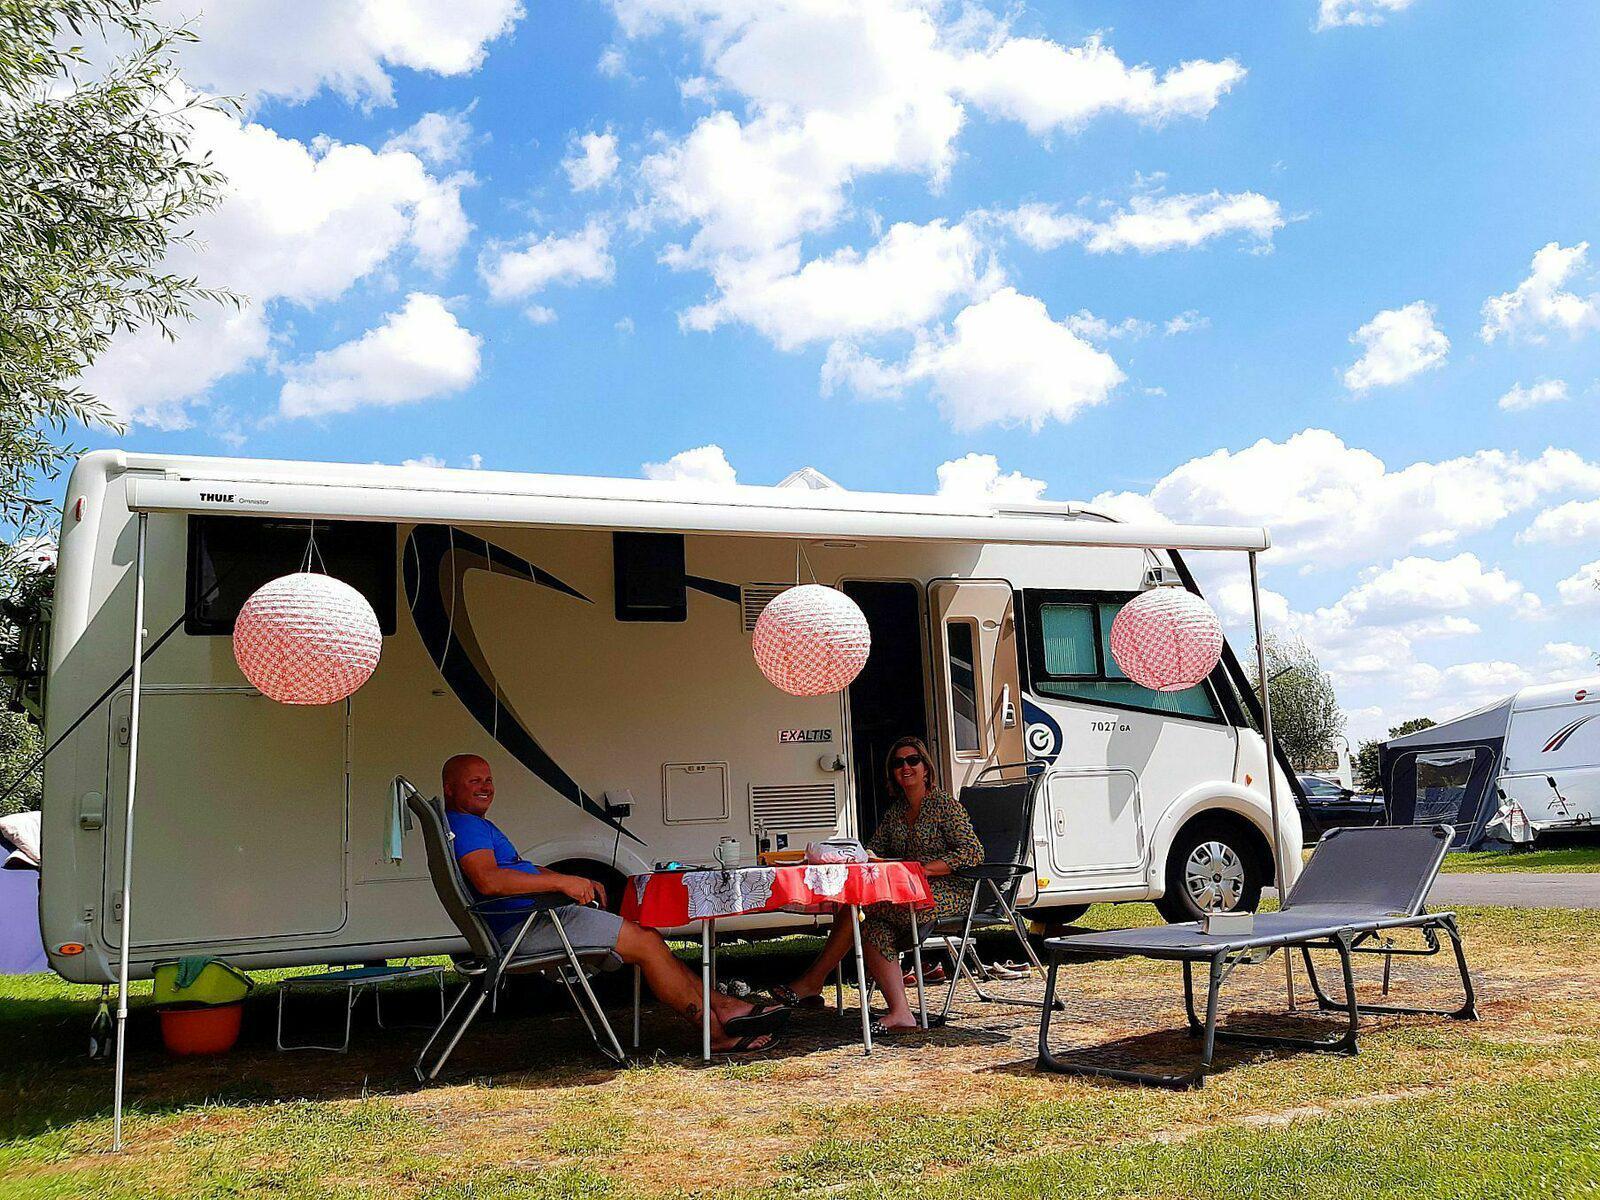 Kompas Camping Nieuwpoort Camperplaats XL